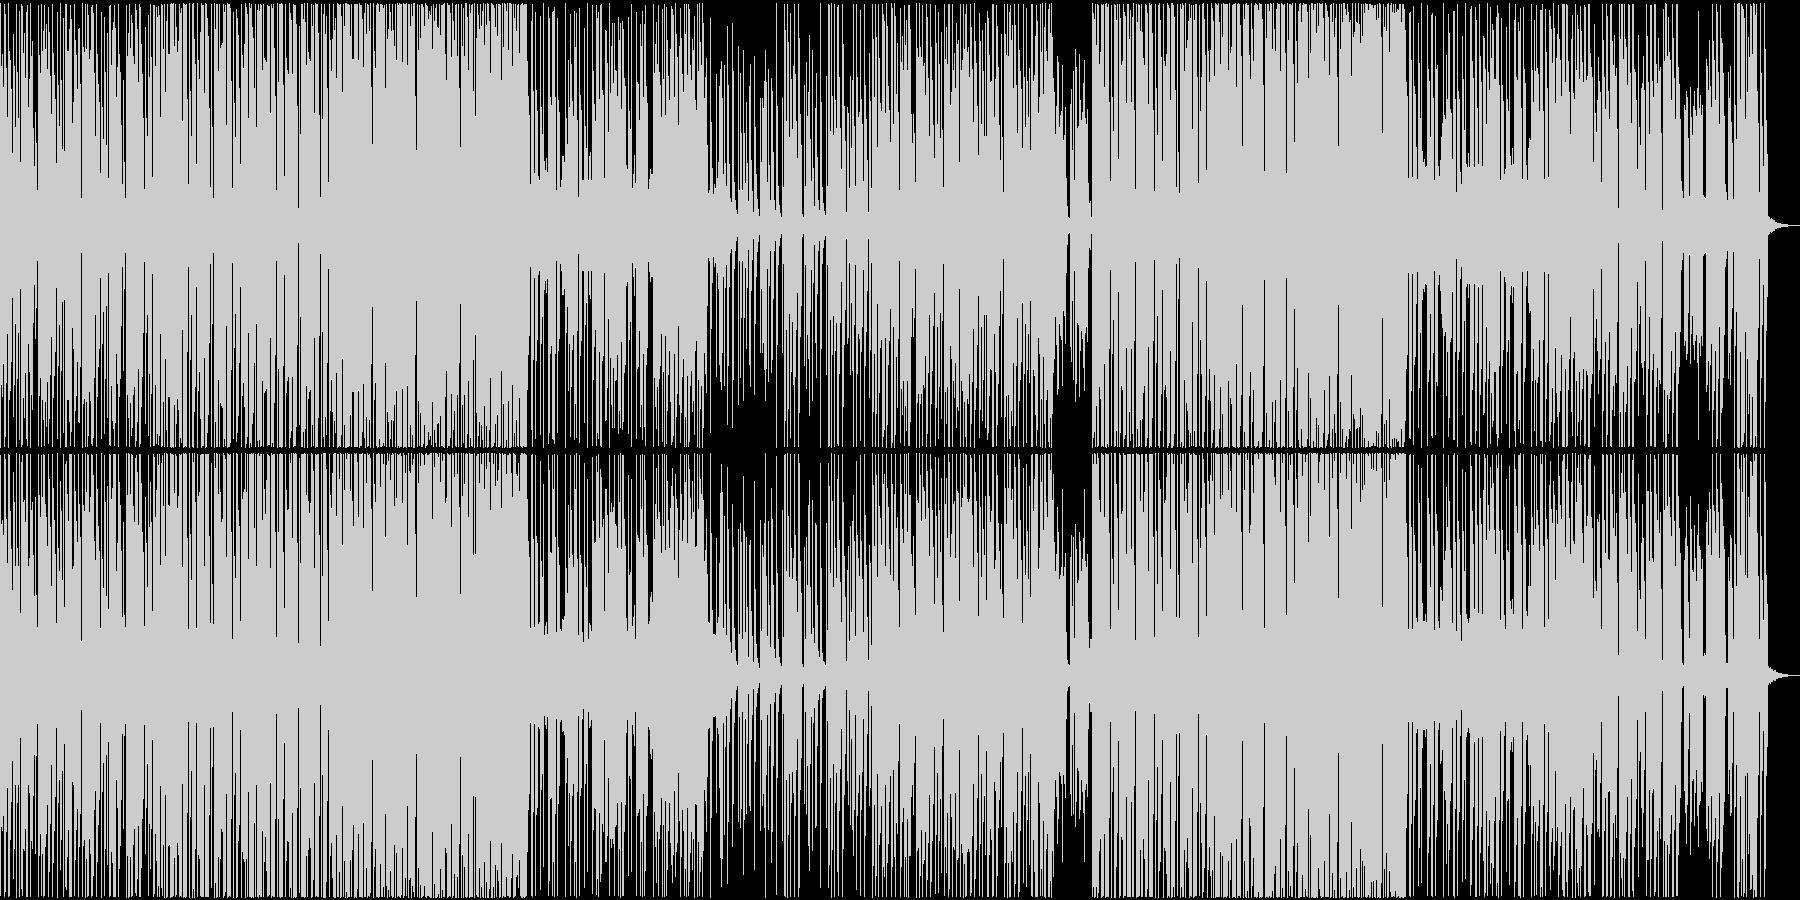 EDM トロピカル 楽しい TRAPの未再生の波形